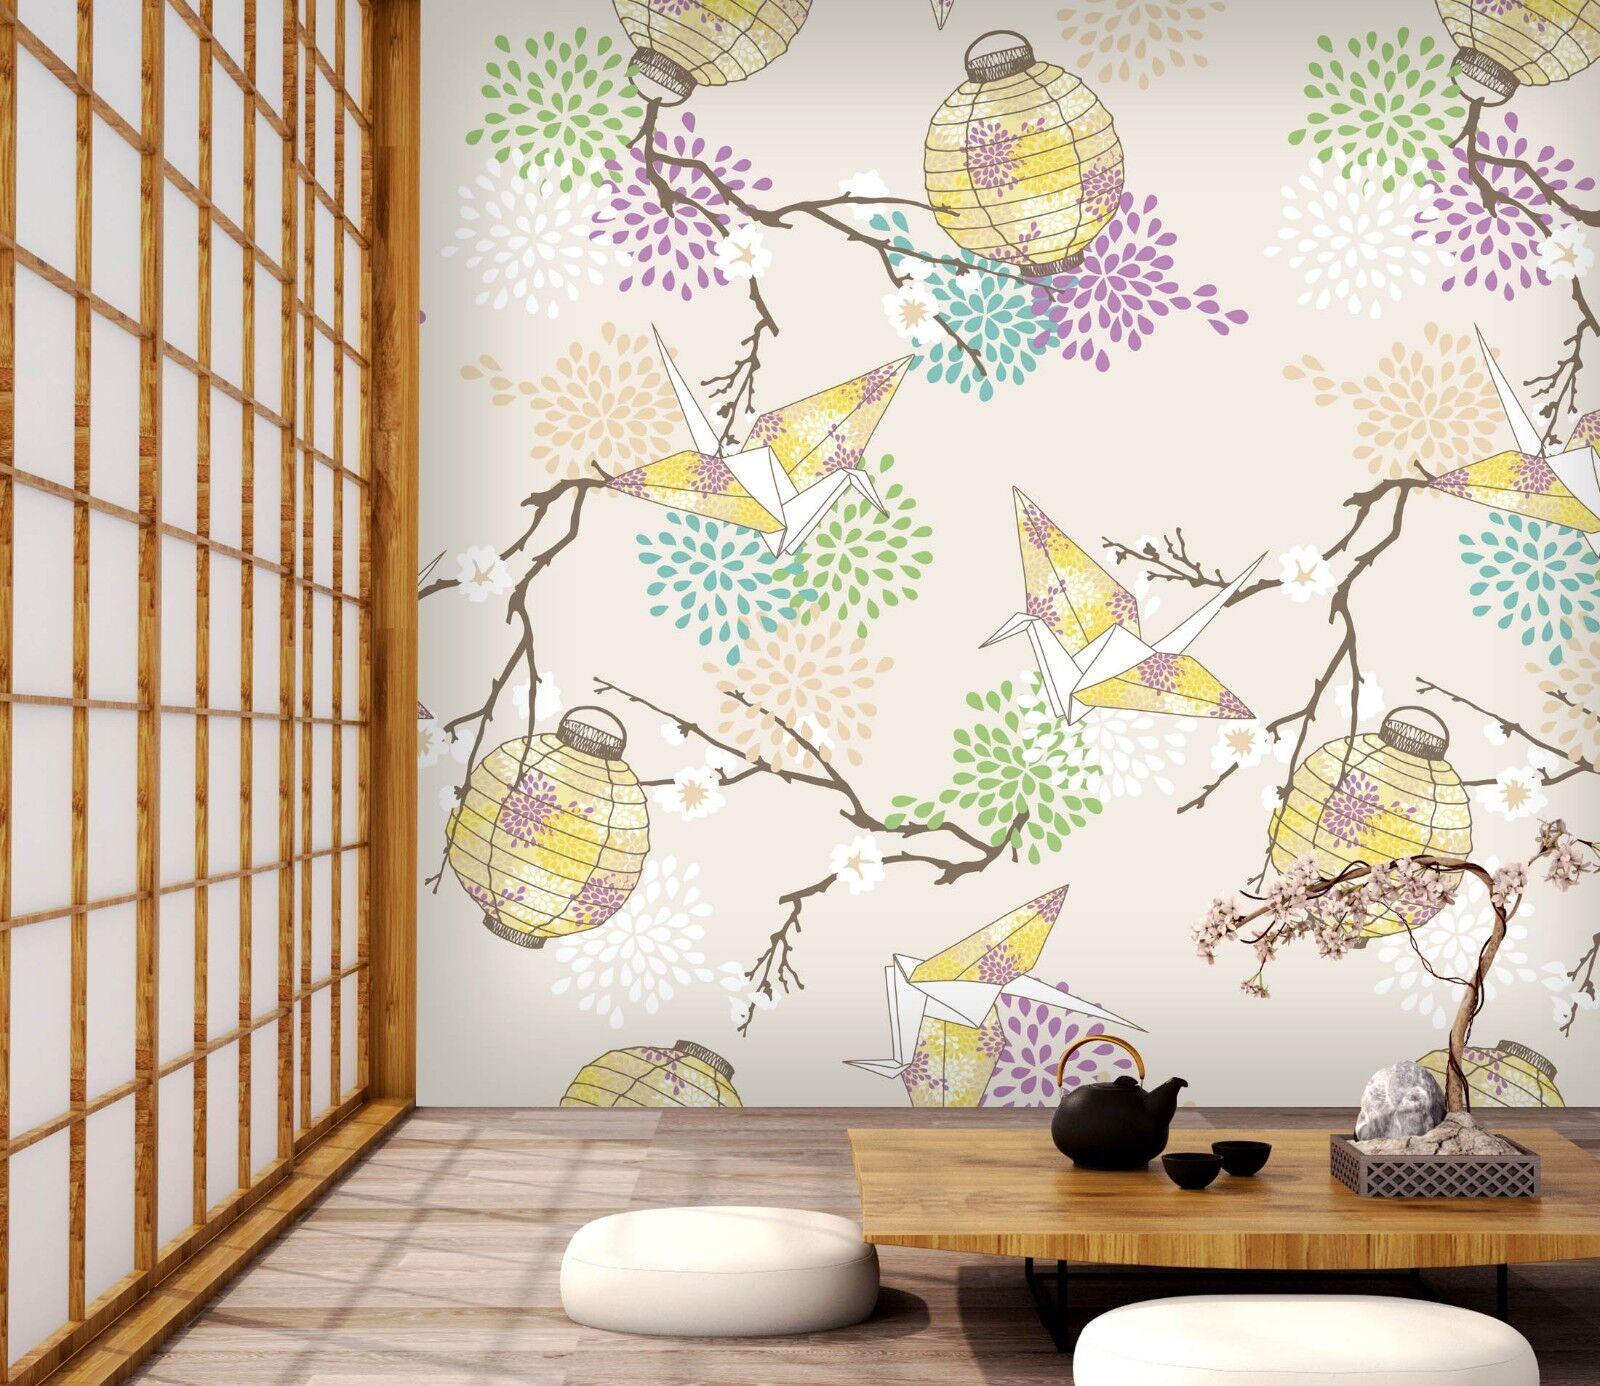 3D Paper Crane And Lantern 4 Wall Paper Wall Print Decal Wall Deco Indoor Murals